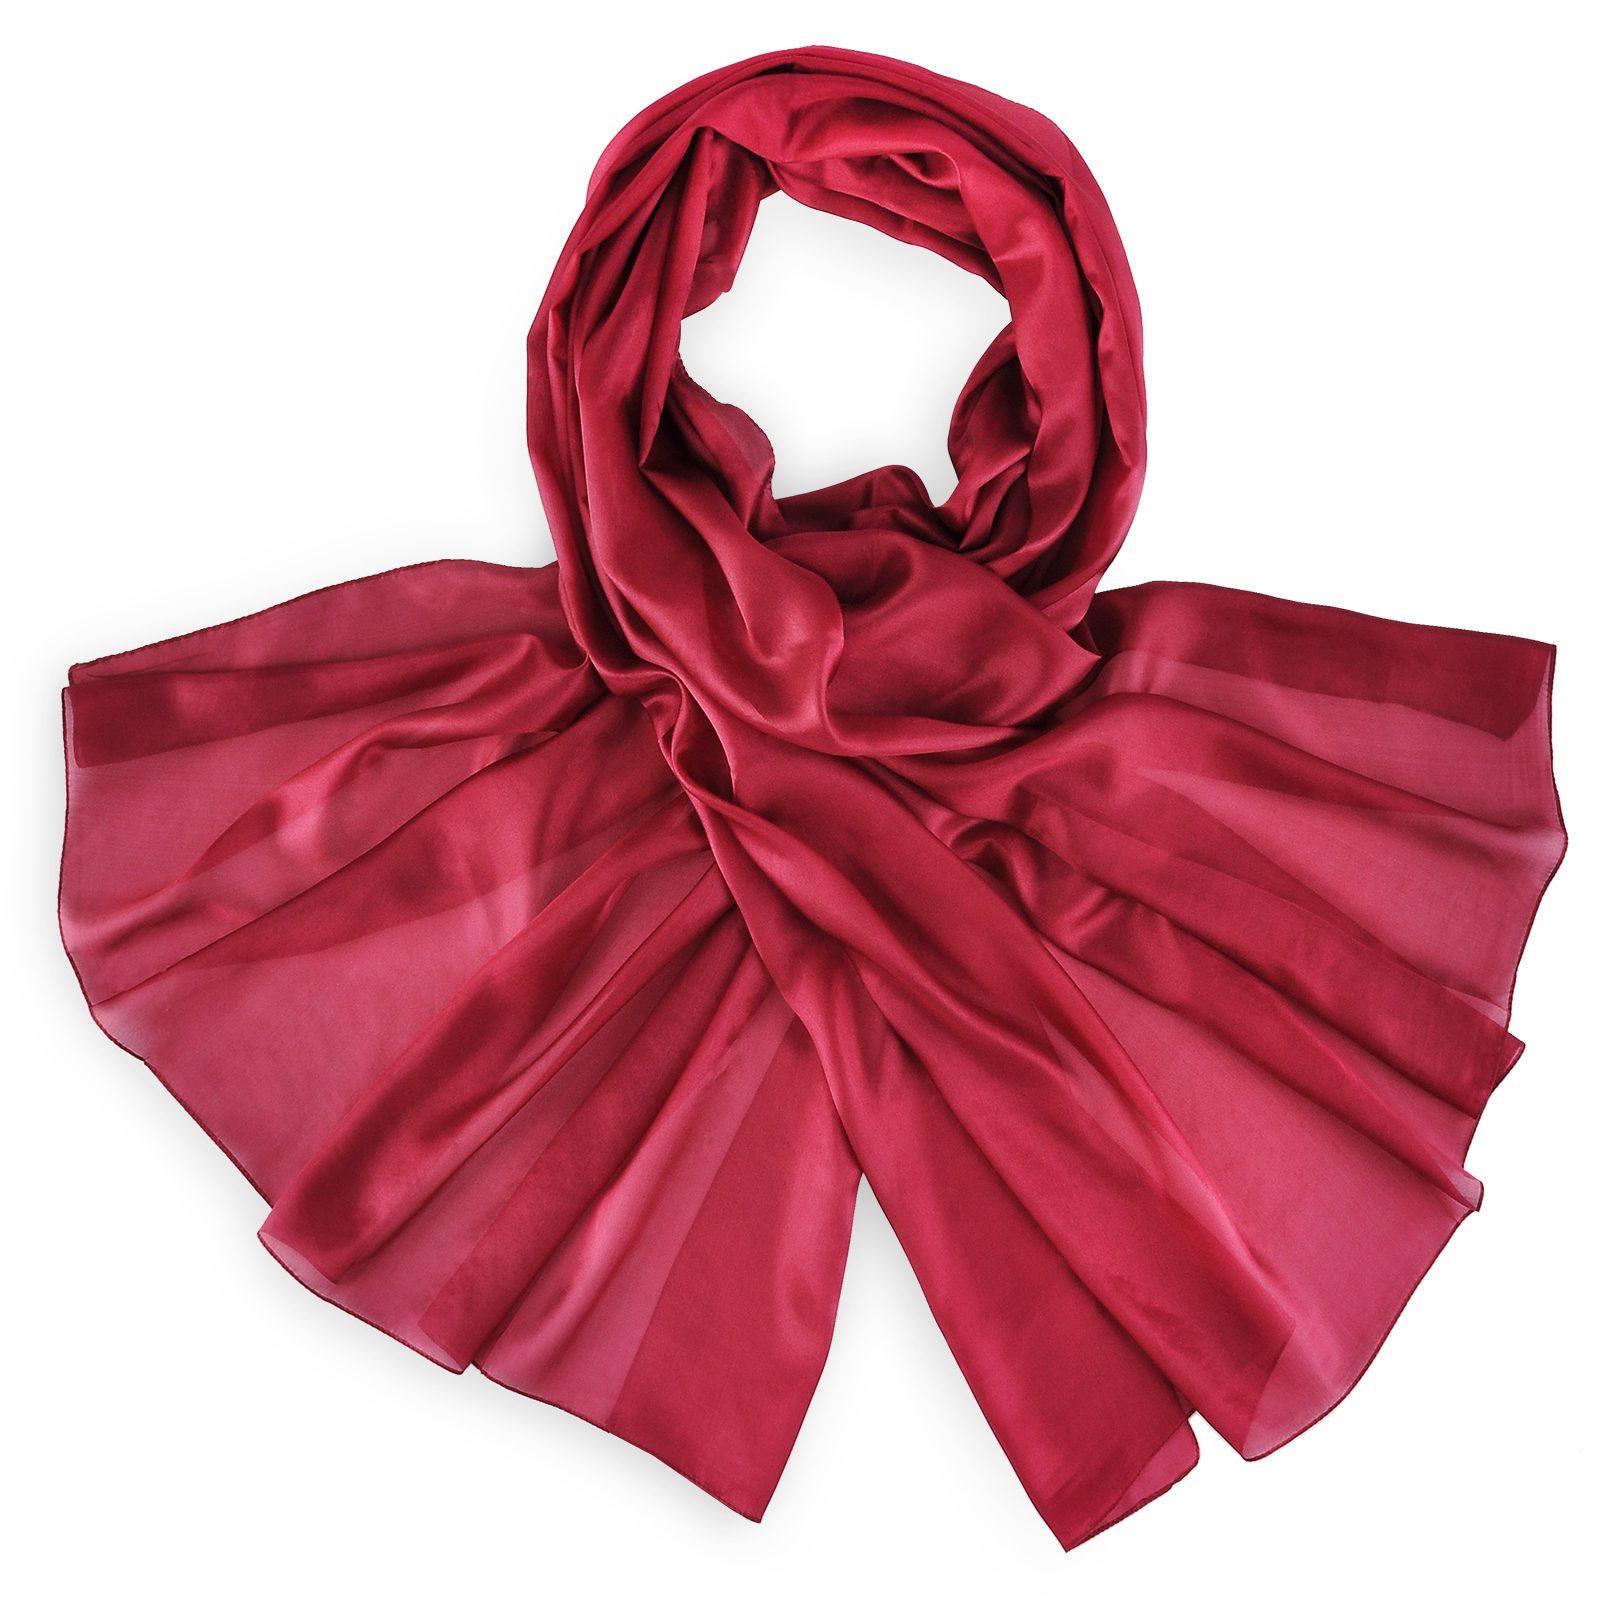 http://lookbook.allee-du-foulard.fr/wp-content/uploads/2018/11/AT-02913-F16-1600x1600.jpg